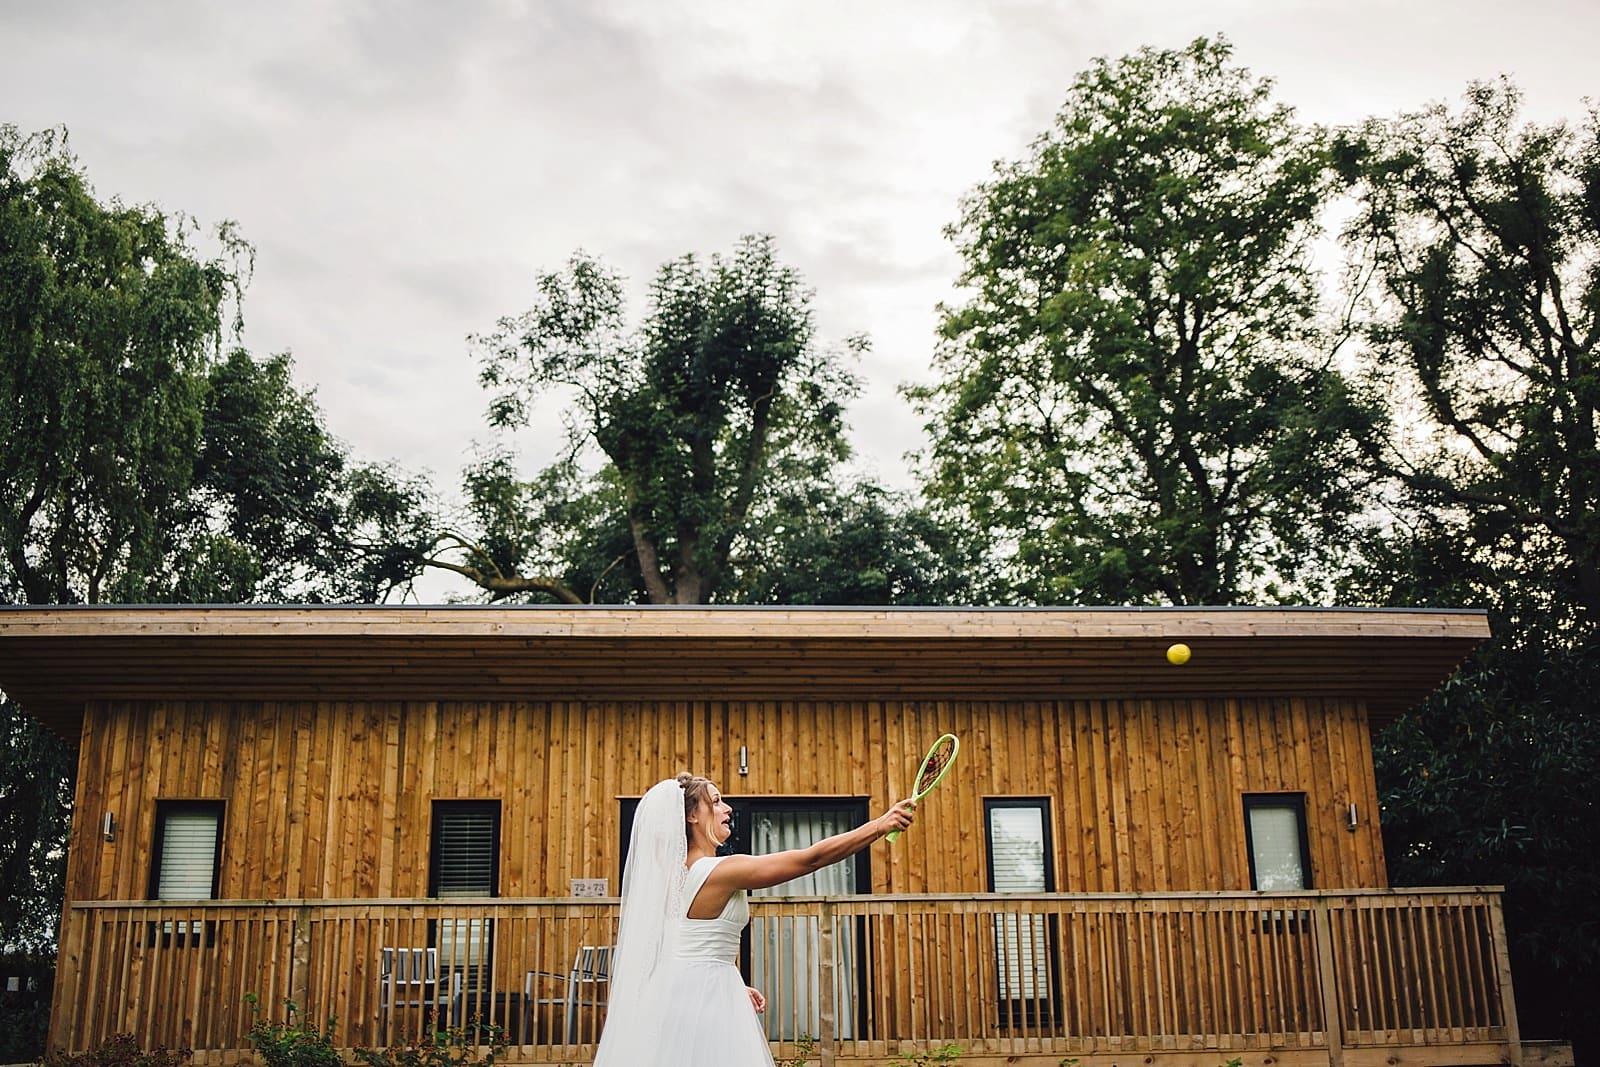 hothorpe-hall-woodlands-wedding-photography_0052